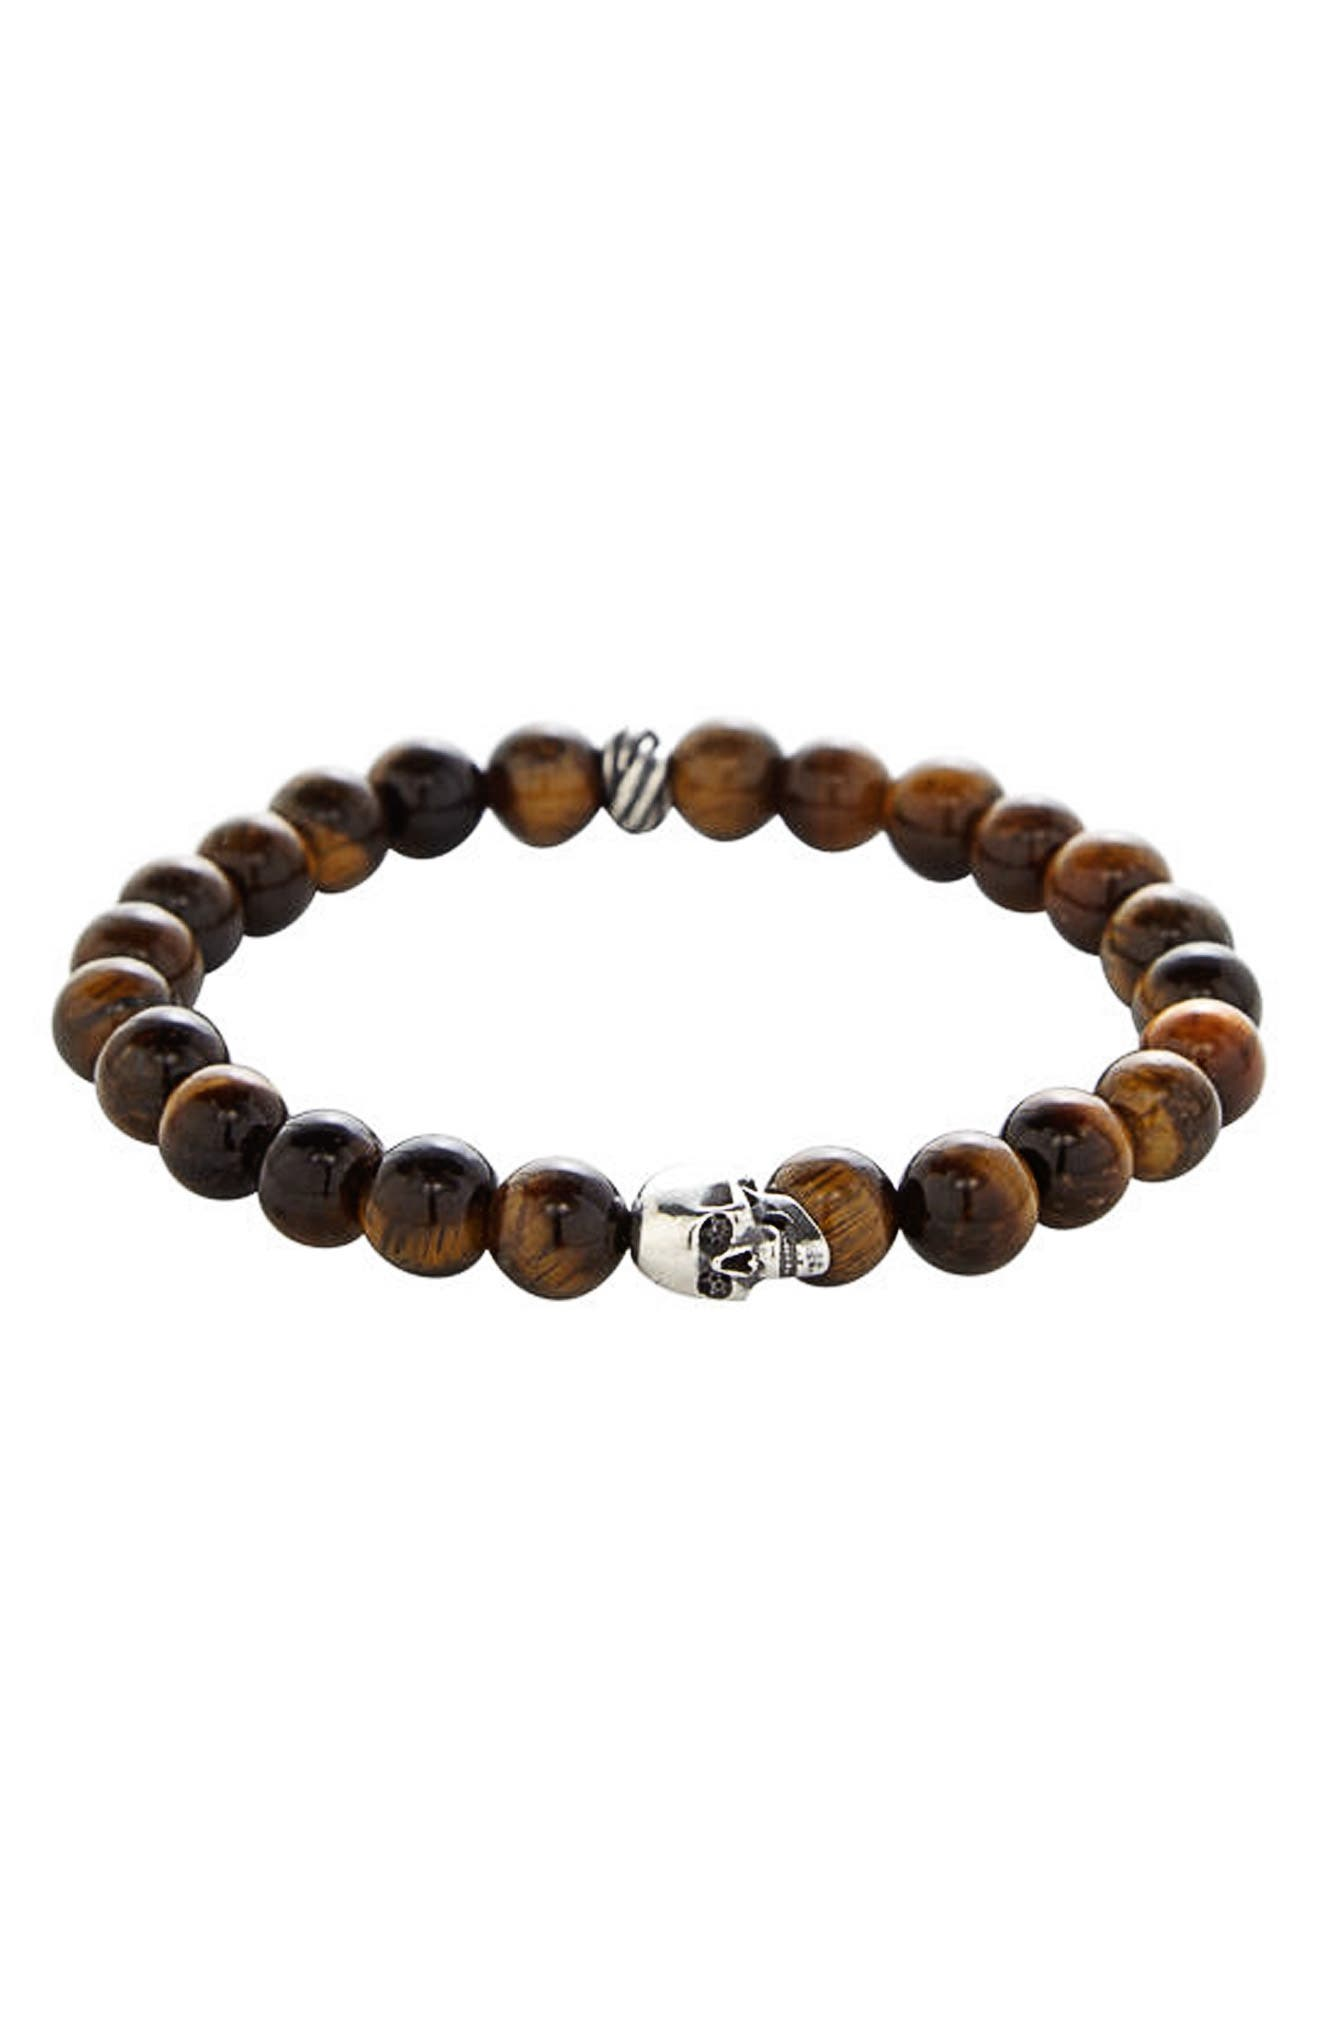 Stone Bead Stretch Bracelet,                             Main thumbnail 1, color,                             200